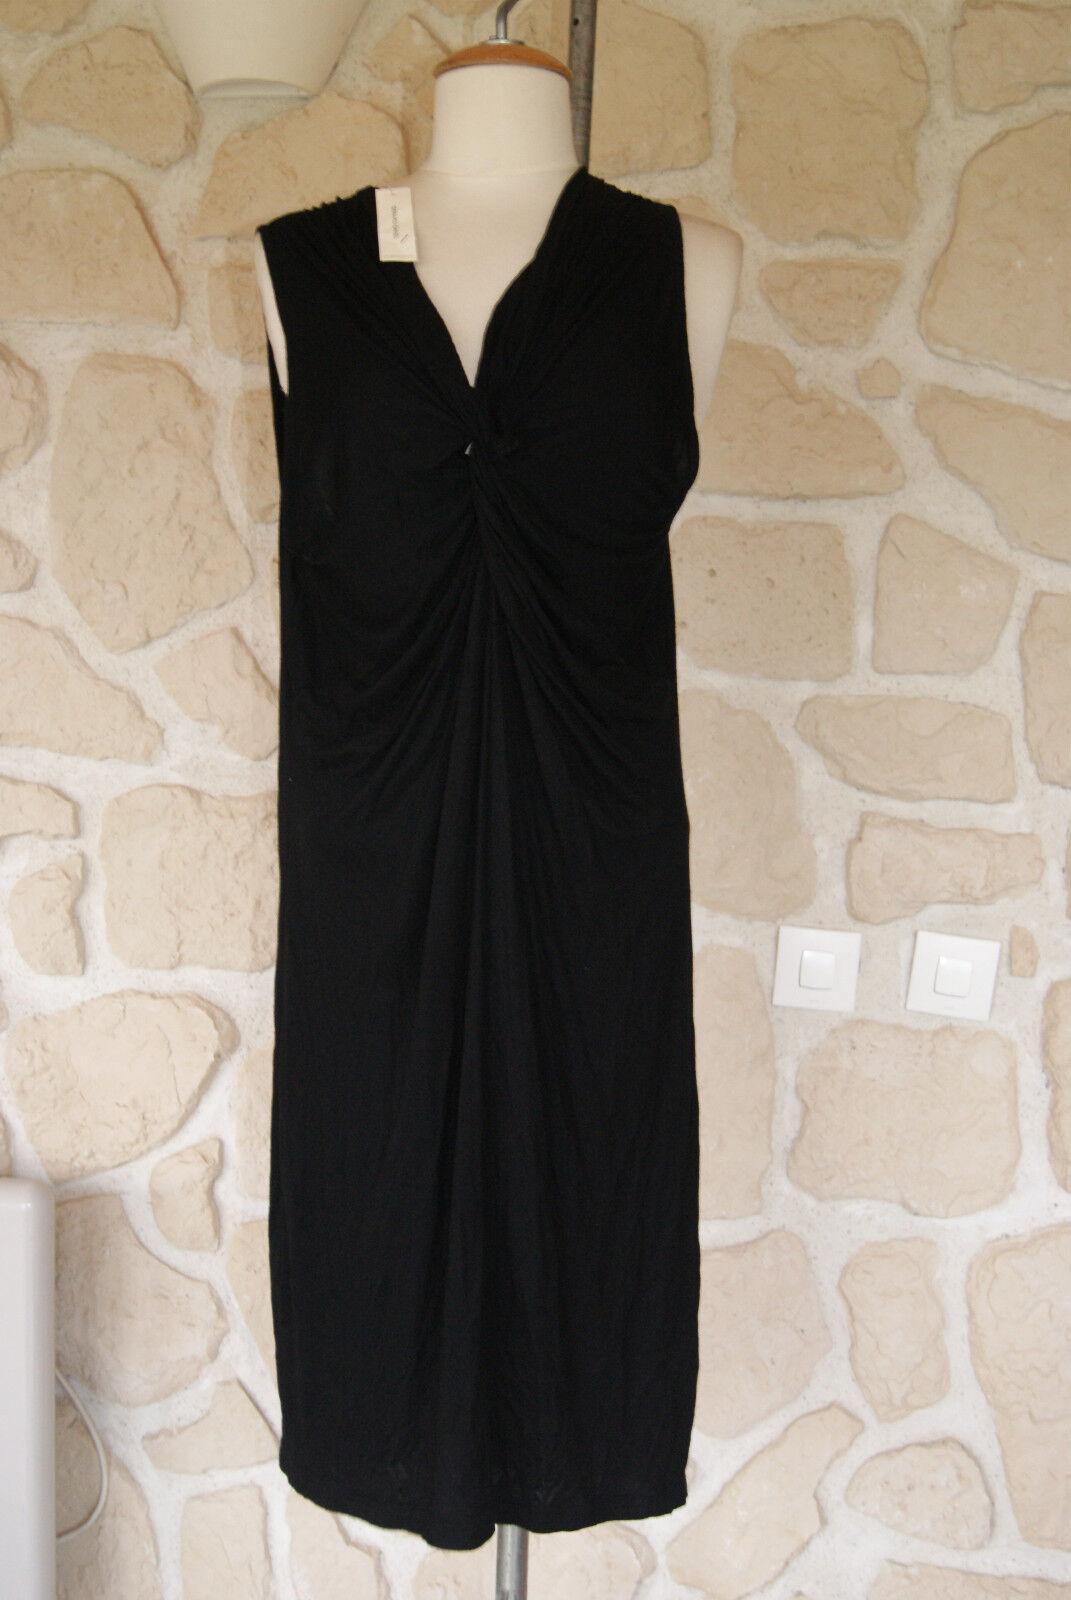 Robe blacke neuve size 4 marque GERARD DAREL étiqueté à